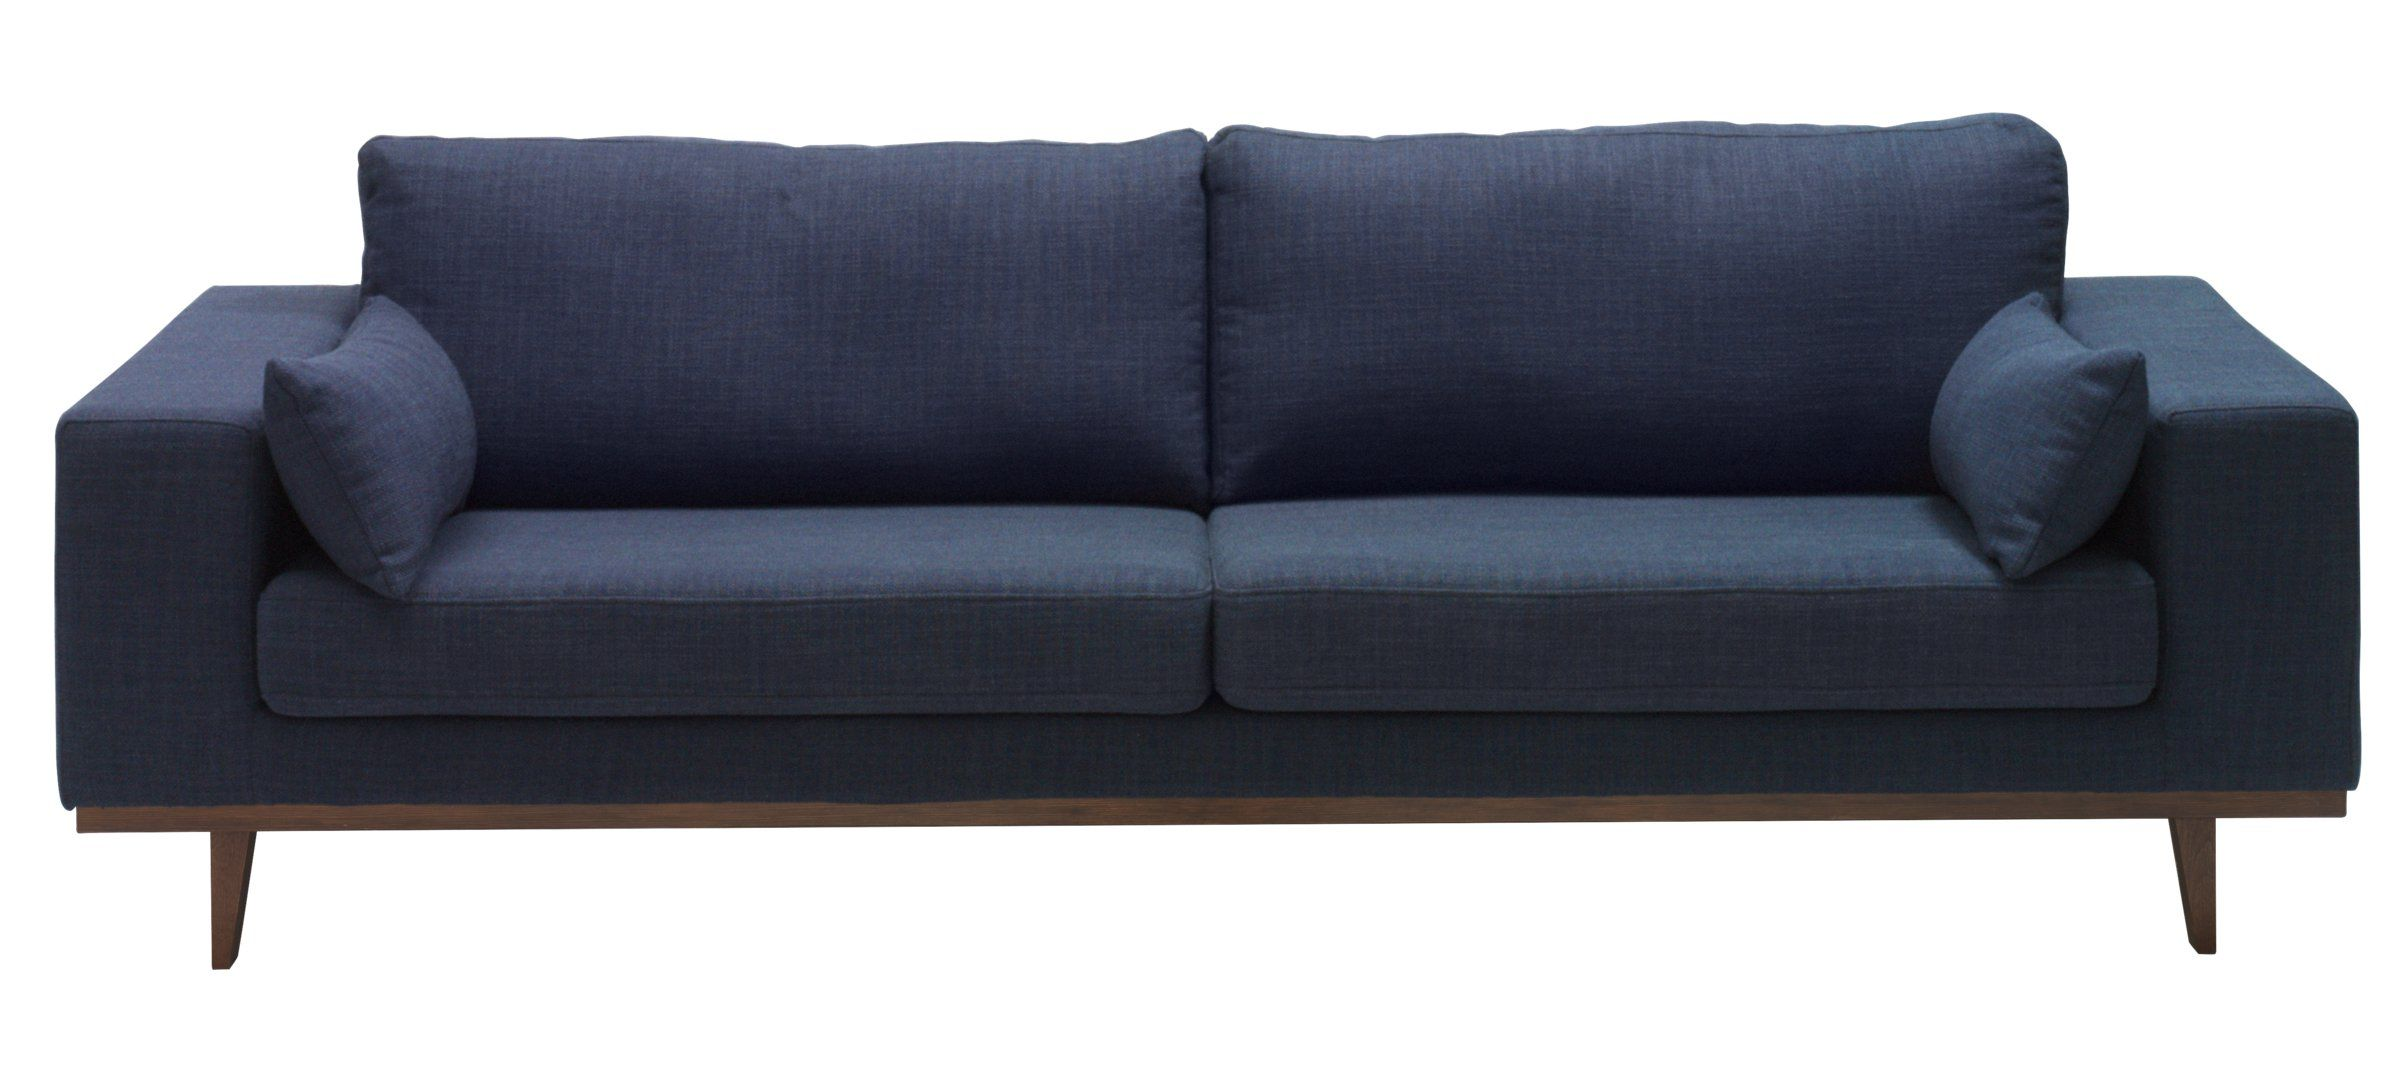 3er-Sofa LORITZ, Stoff, Blau, B:238 H:81 T:90 cm - Sofas - Micasa ...